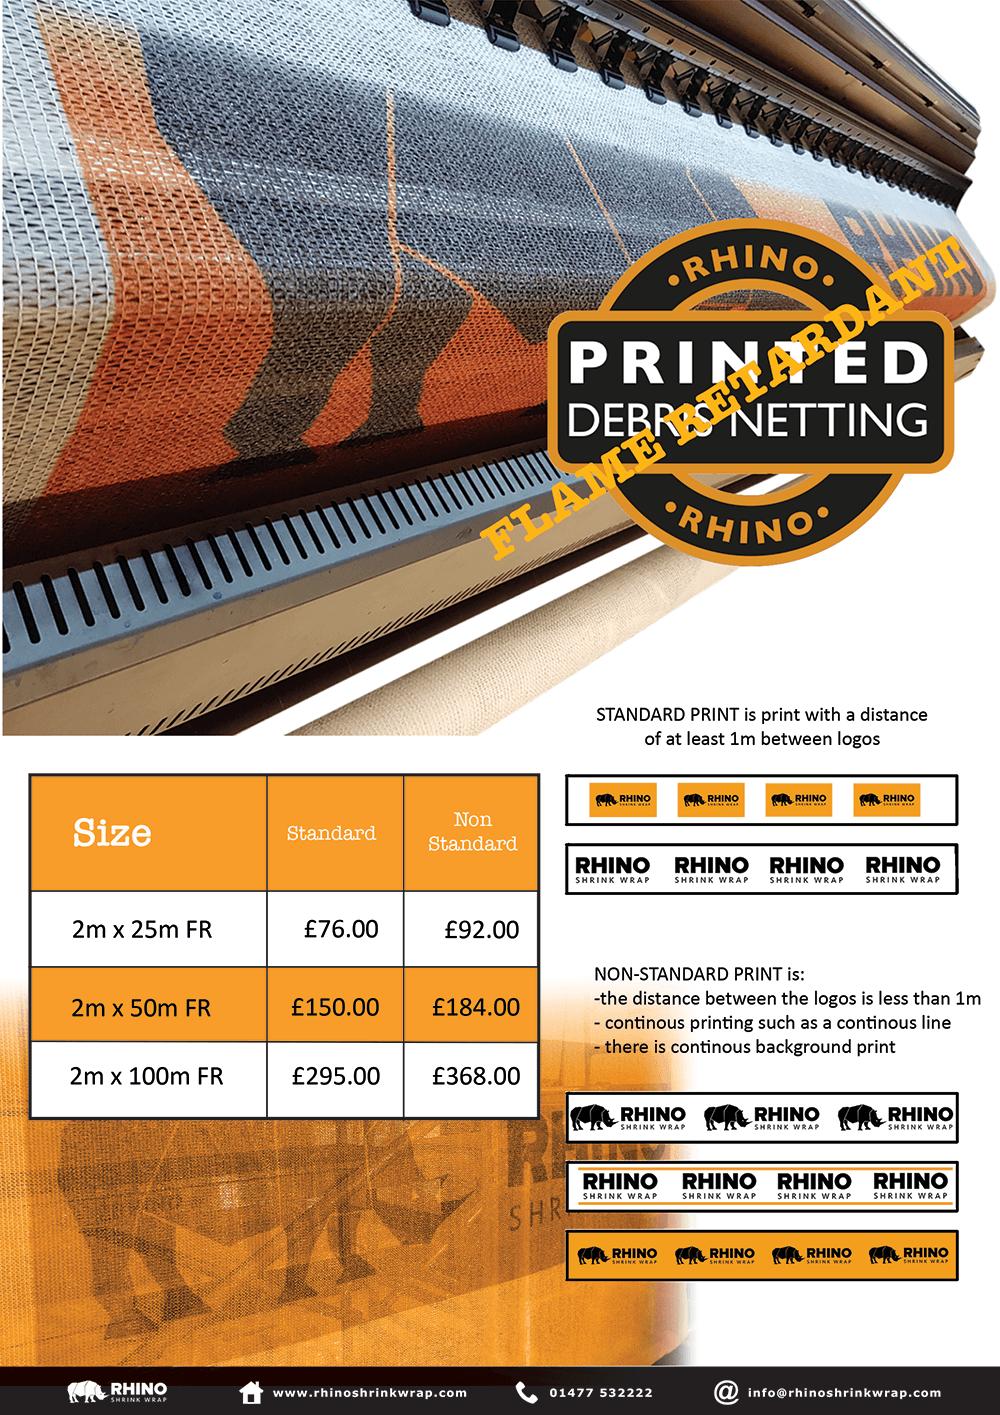 Flame Retardant Printed Debris Netting Price List